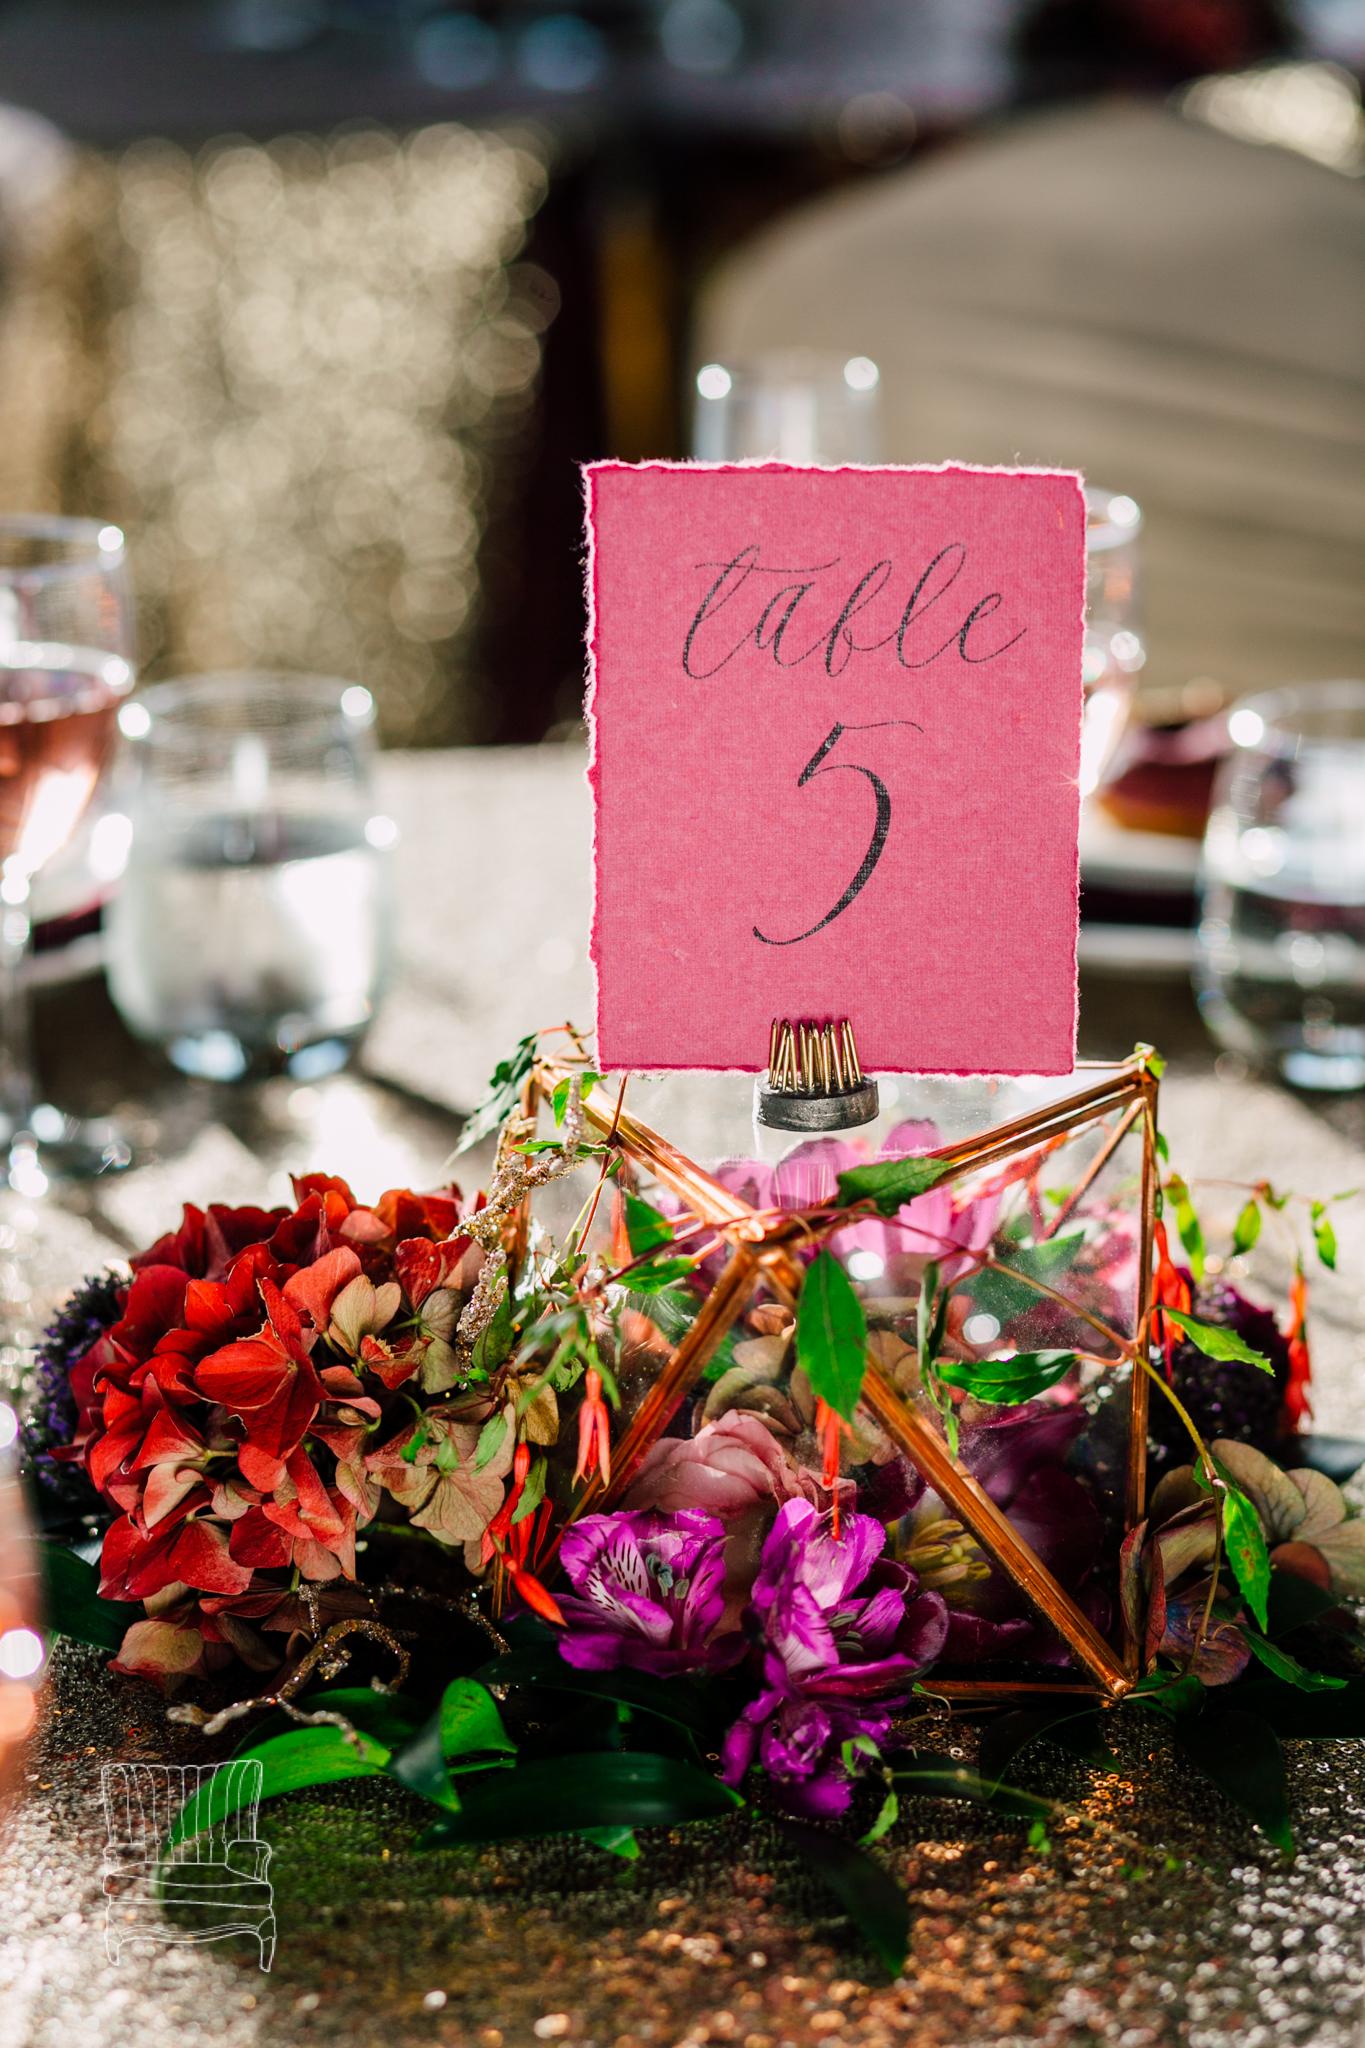 bellwether-bellingham-wedding-styled-katheryn-moran-photography-1.jpg